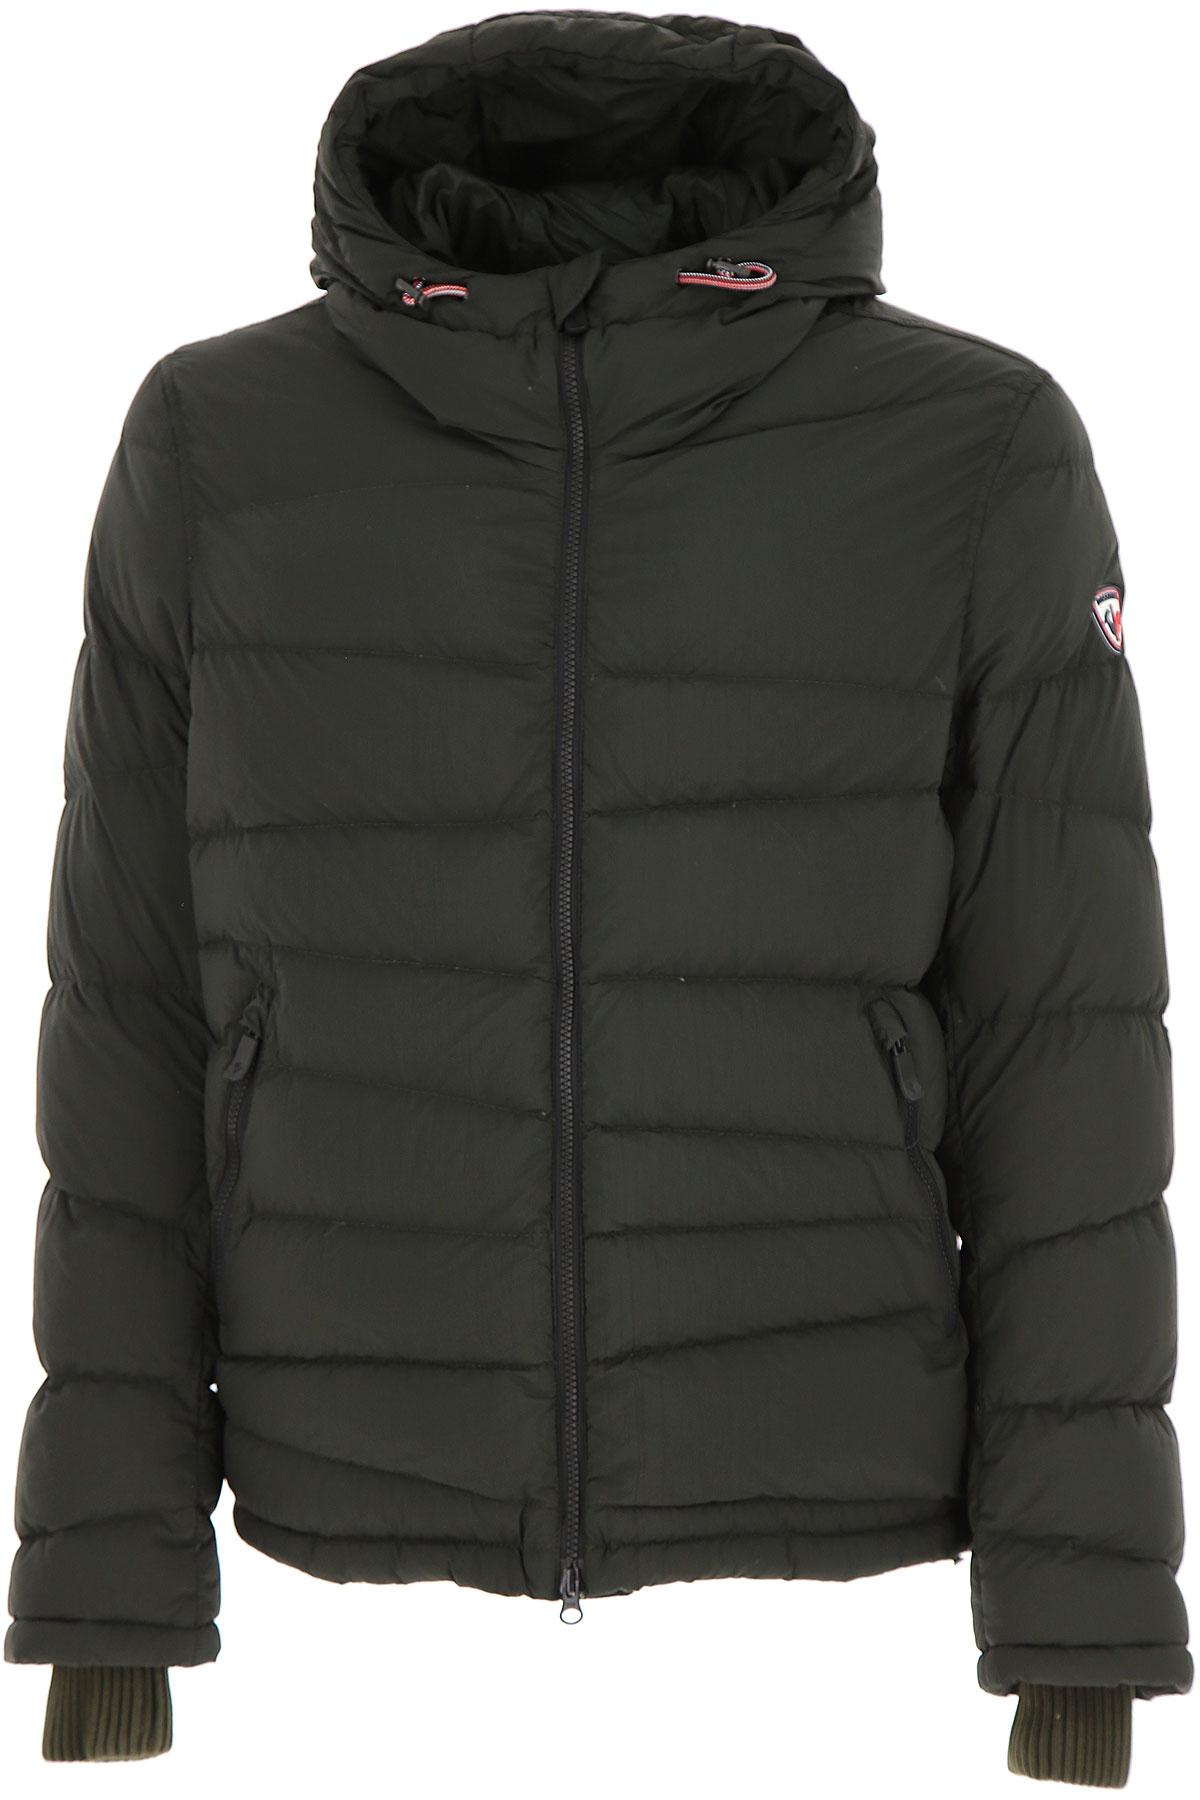 Image of Rossignol Down Jacket for Men, Puffer Ski Jacket, Dark Military Green, polyamide, 2017, L M S XL XXL